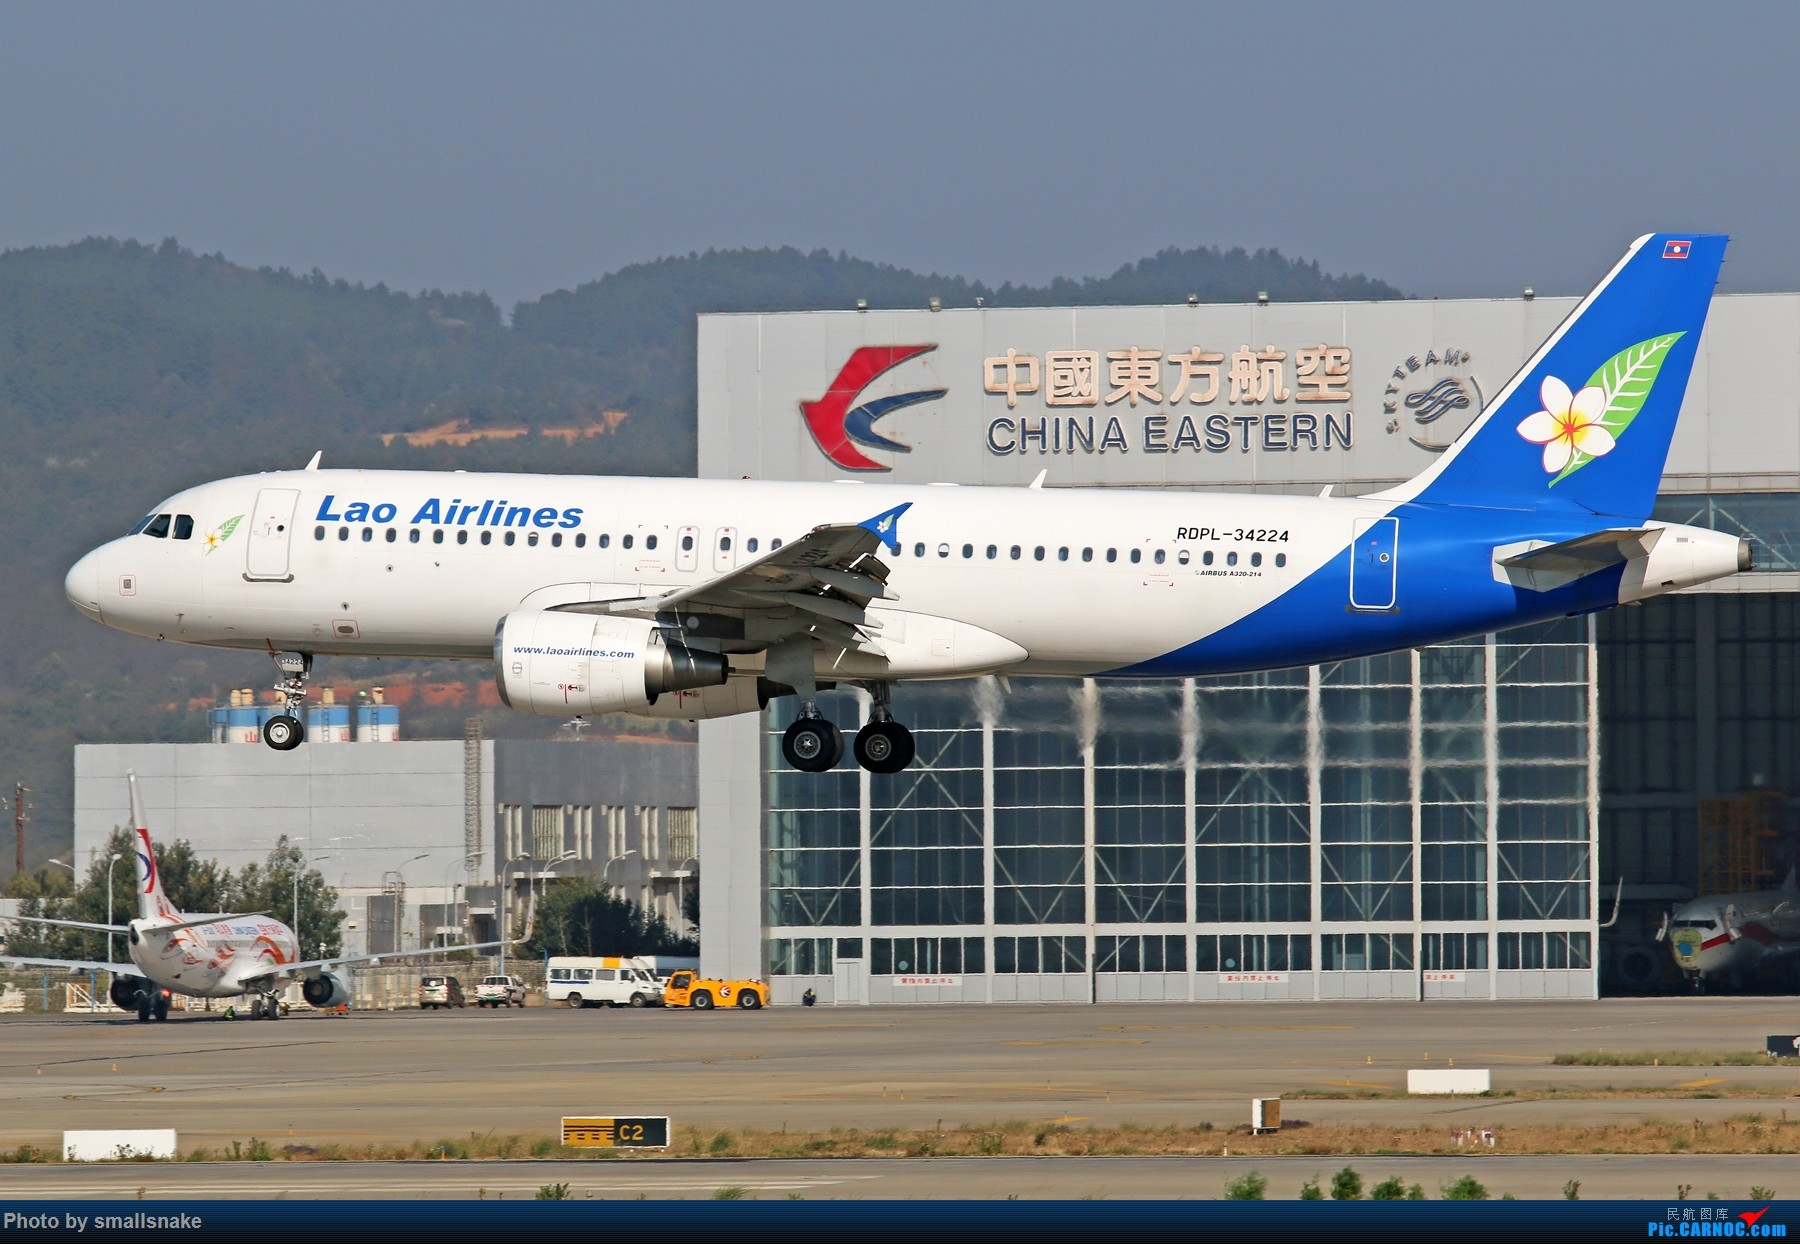 Re:[原创]KMG打卡... AIRBUS A330-300 RDPL-34224 昆明长水国际机场